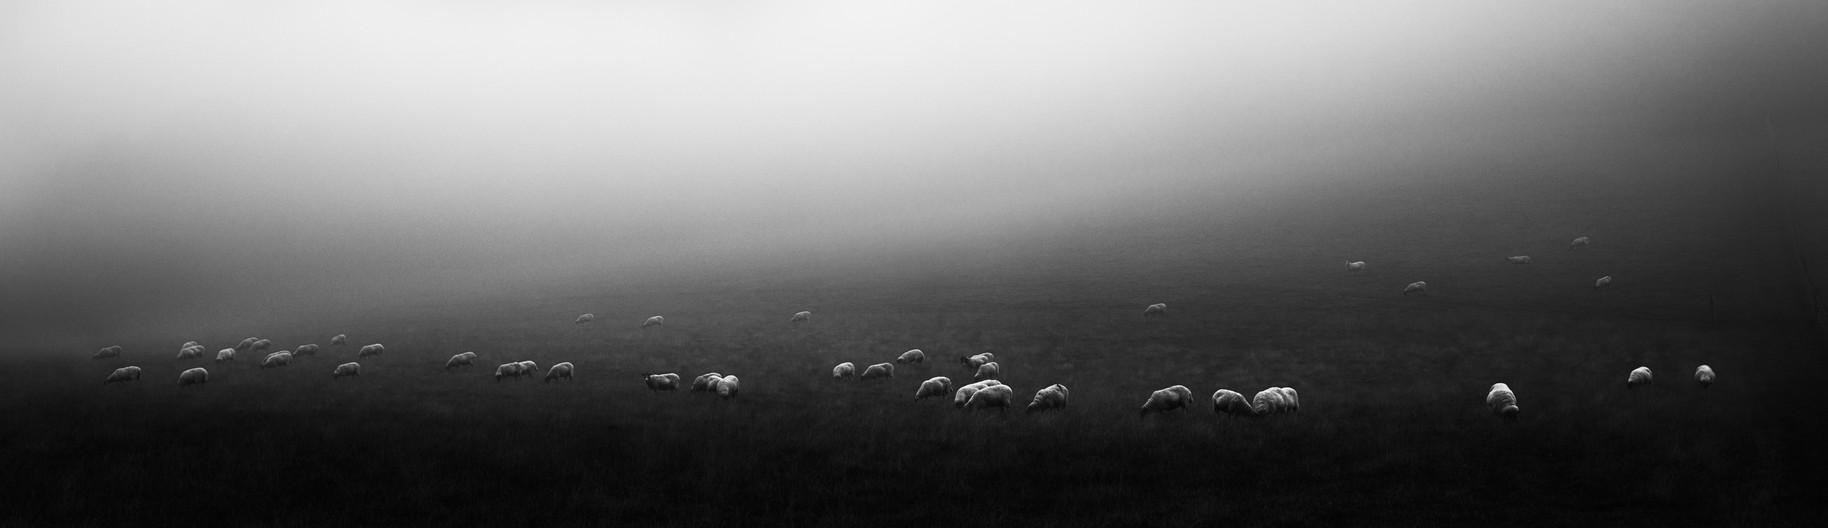 Sheep, Oxfordshire